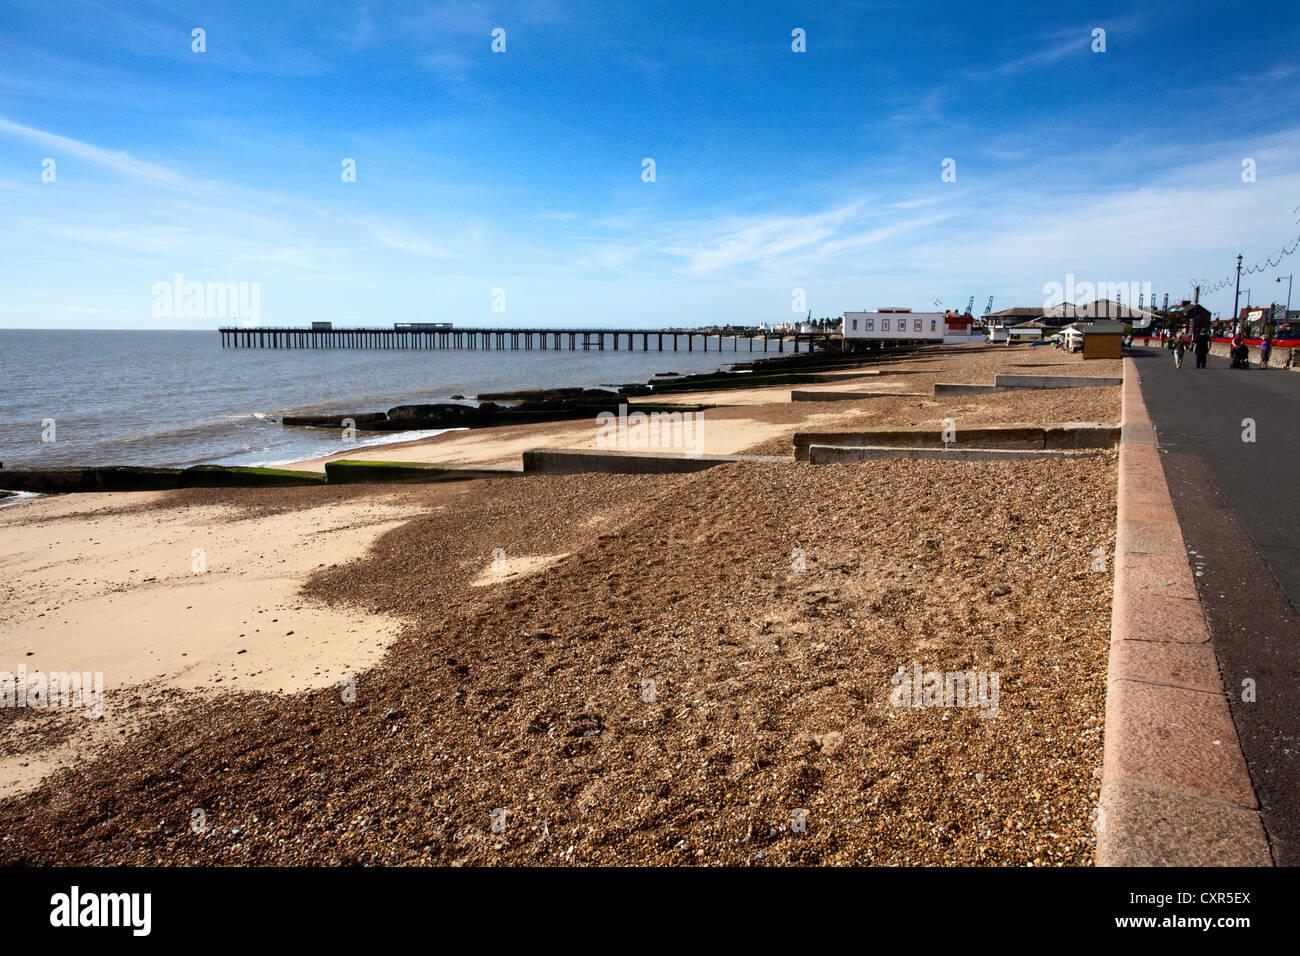 Felixstowe Beach and Pier Suffolk England - Stock Image